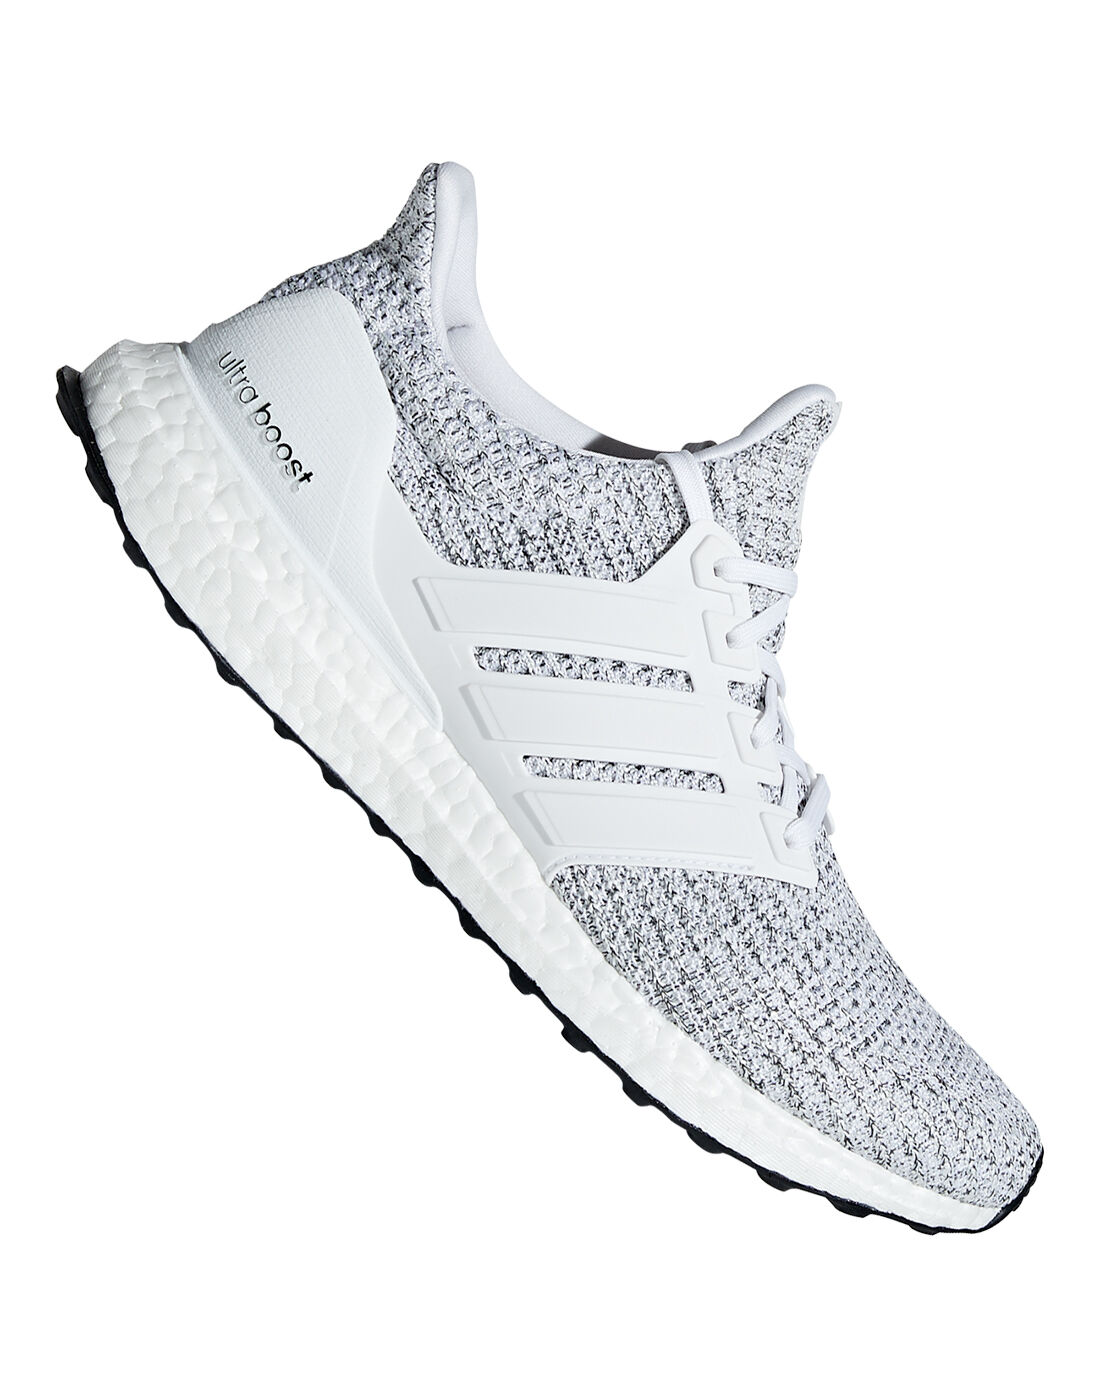 Men's Grey \u0026 White adidas Ultra Boost